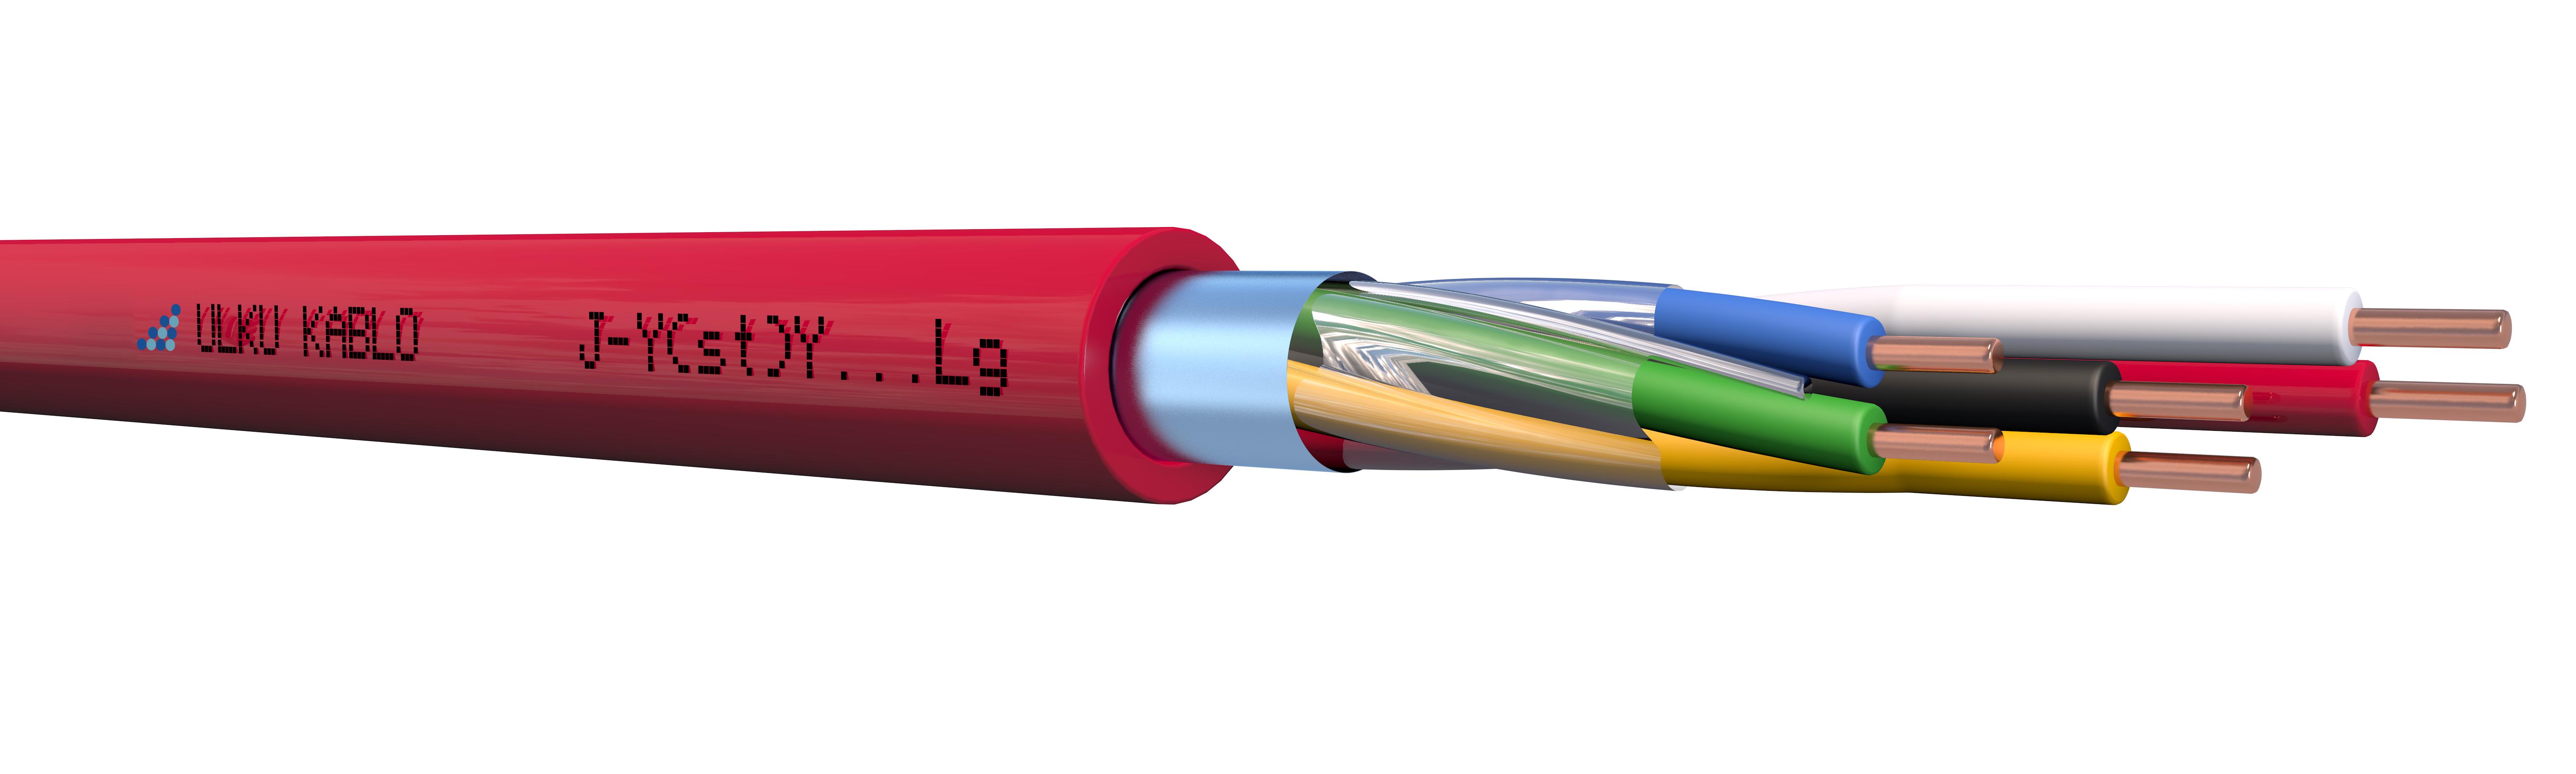 Ülkü Kablo J-Y(St)Y...Lg 3x2x1,50mm²+0,80mm